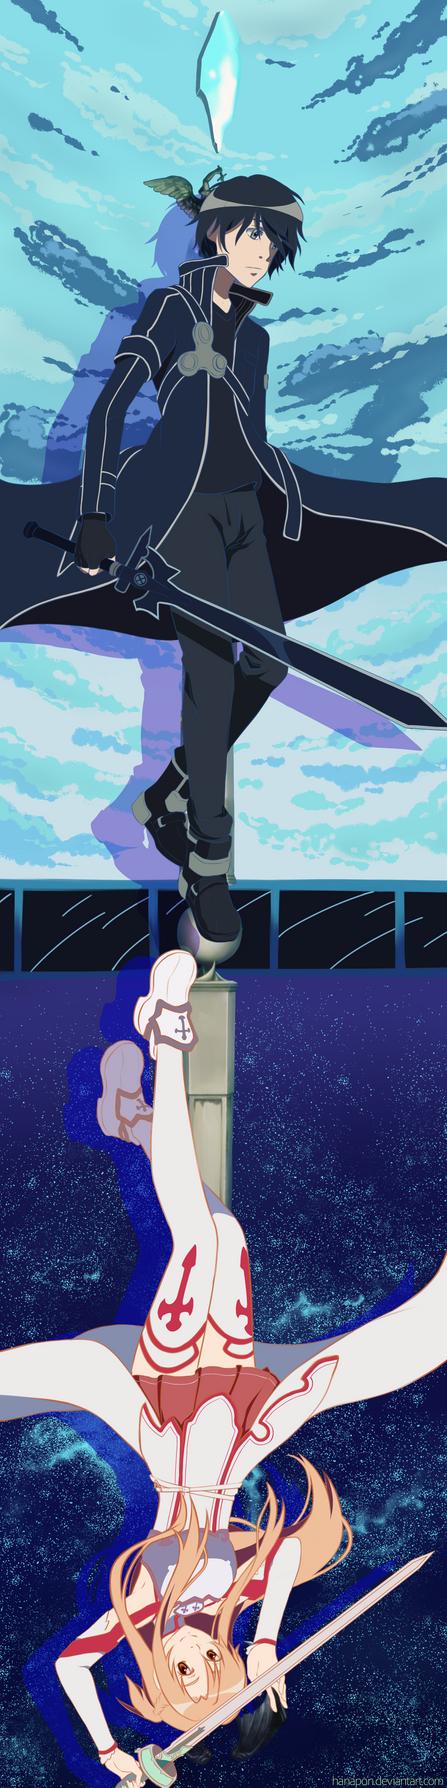 SAO: Dream World by HanaPon